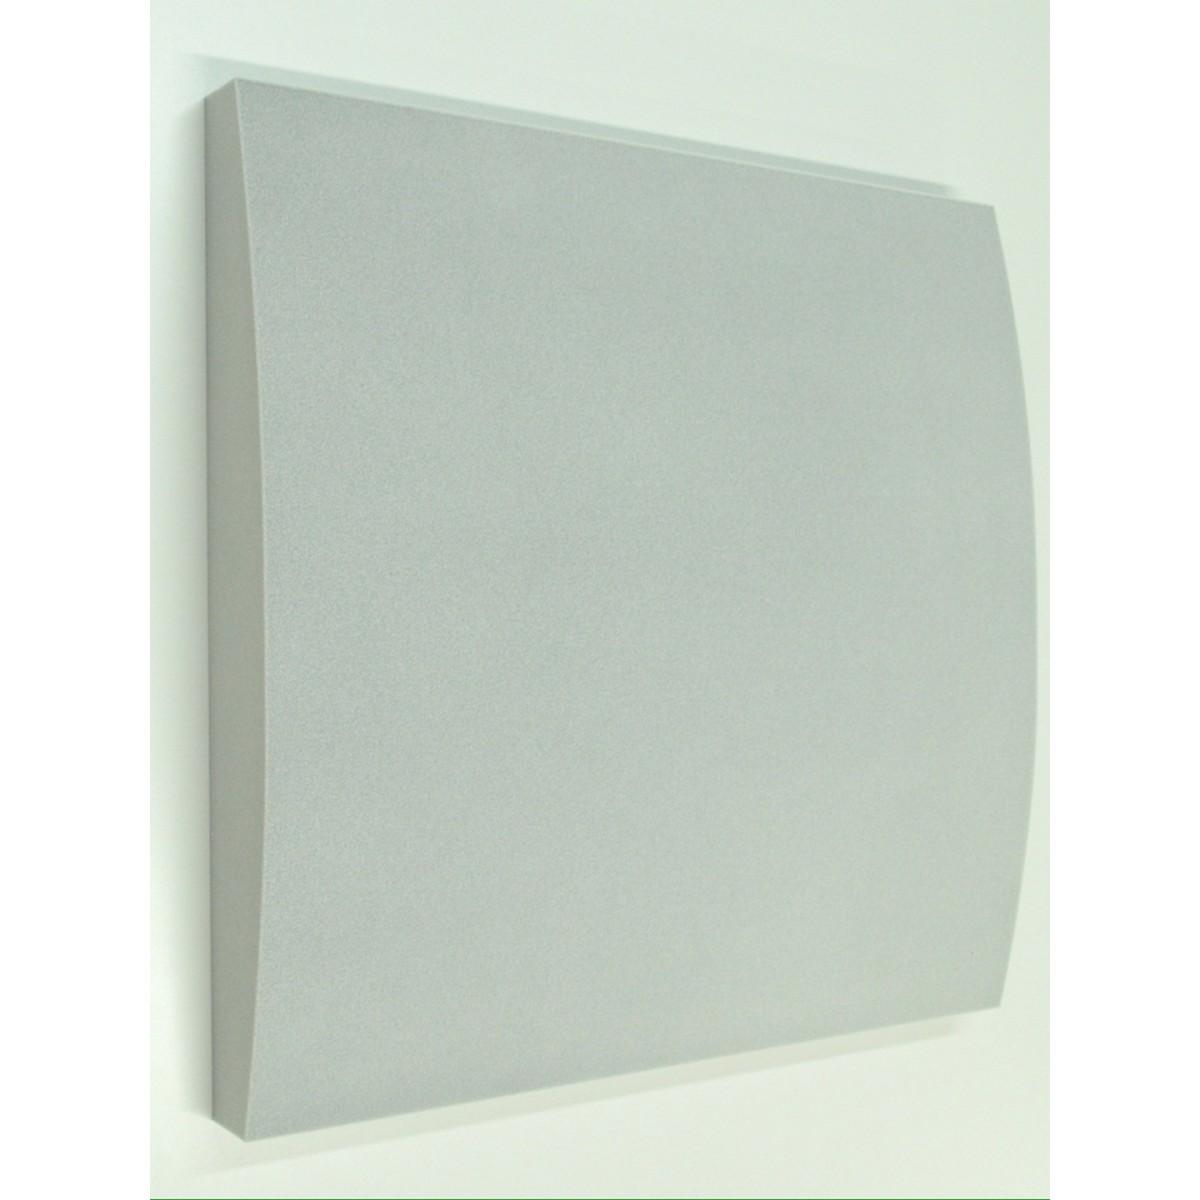 EliAcoustic Curve 60 Premiere White (Ref 101). Panel acustico decorativo